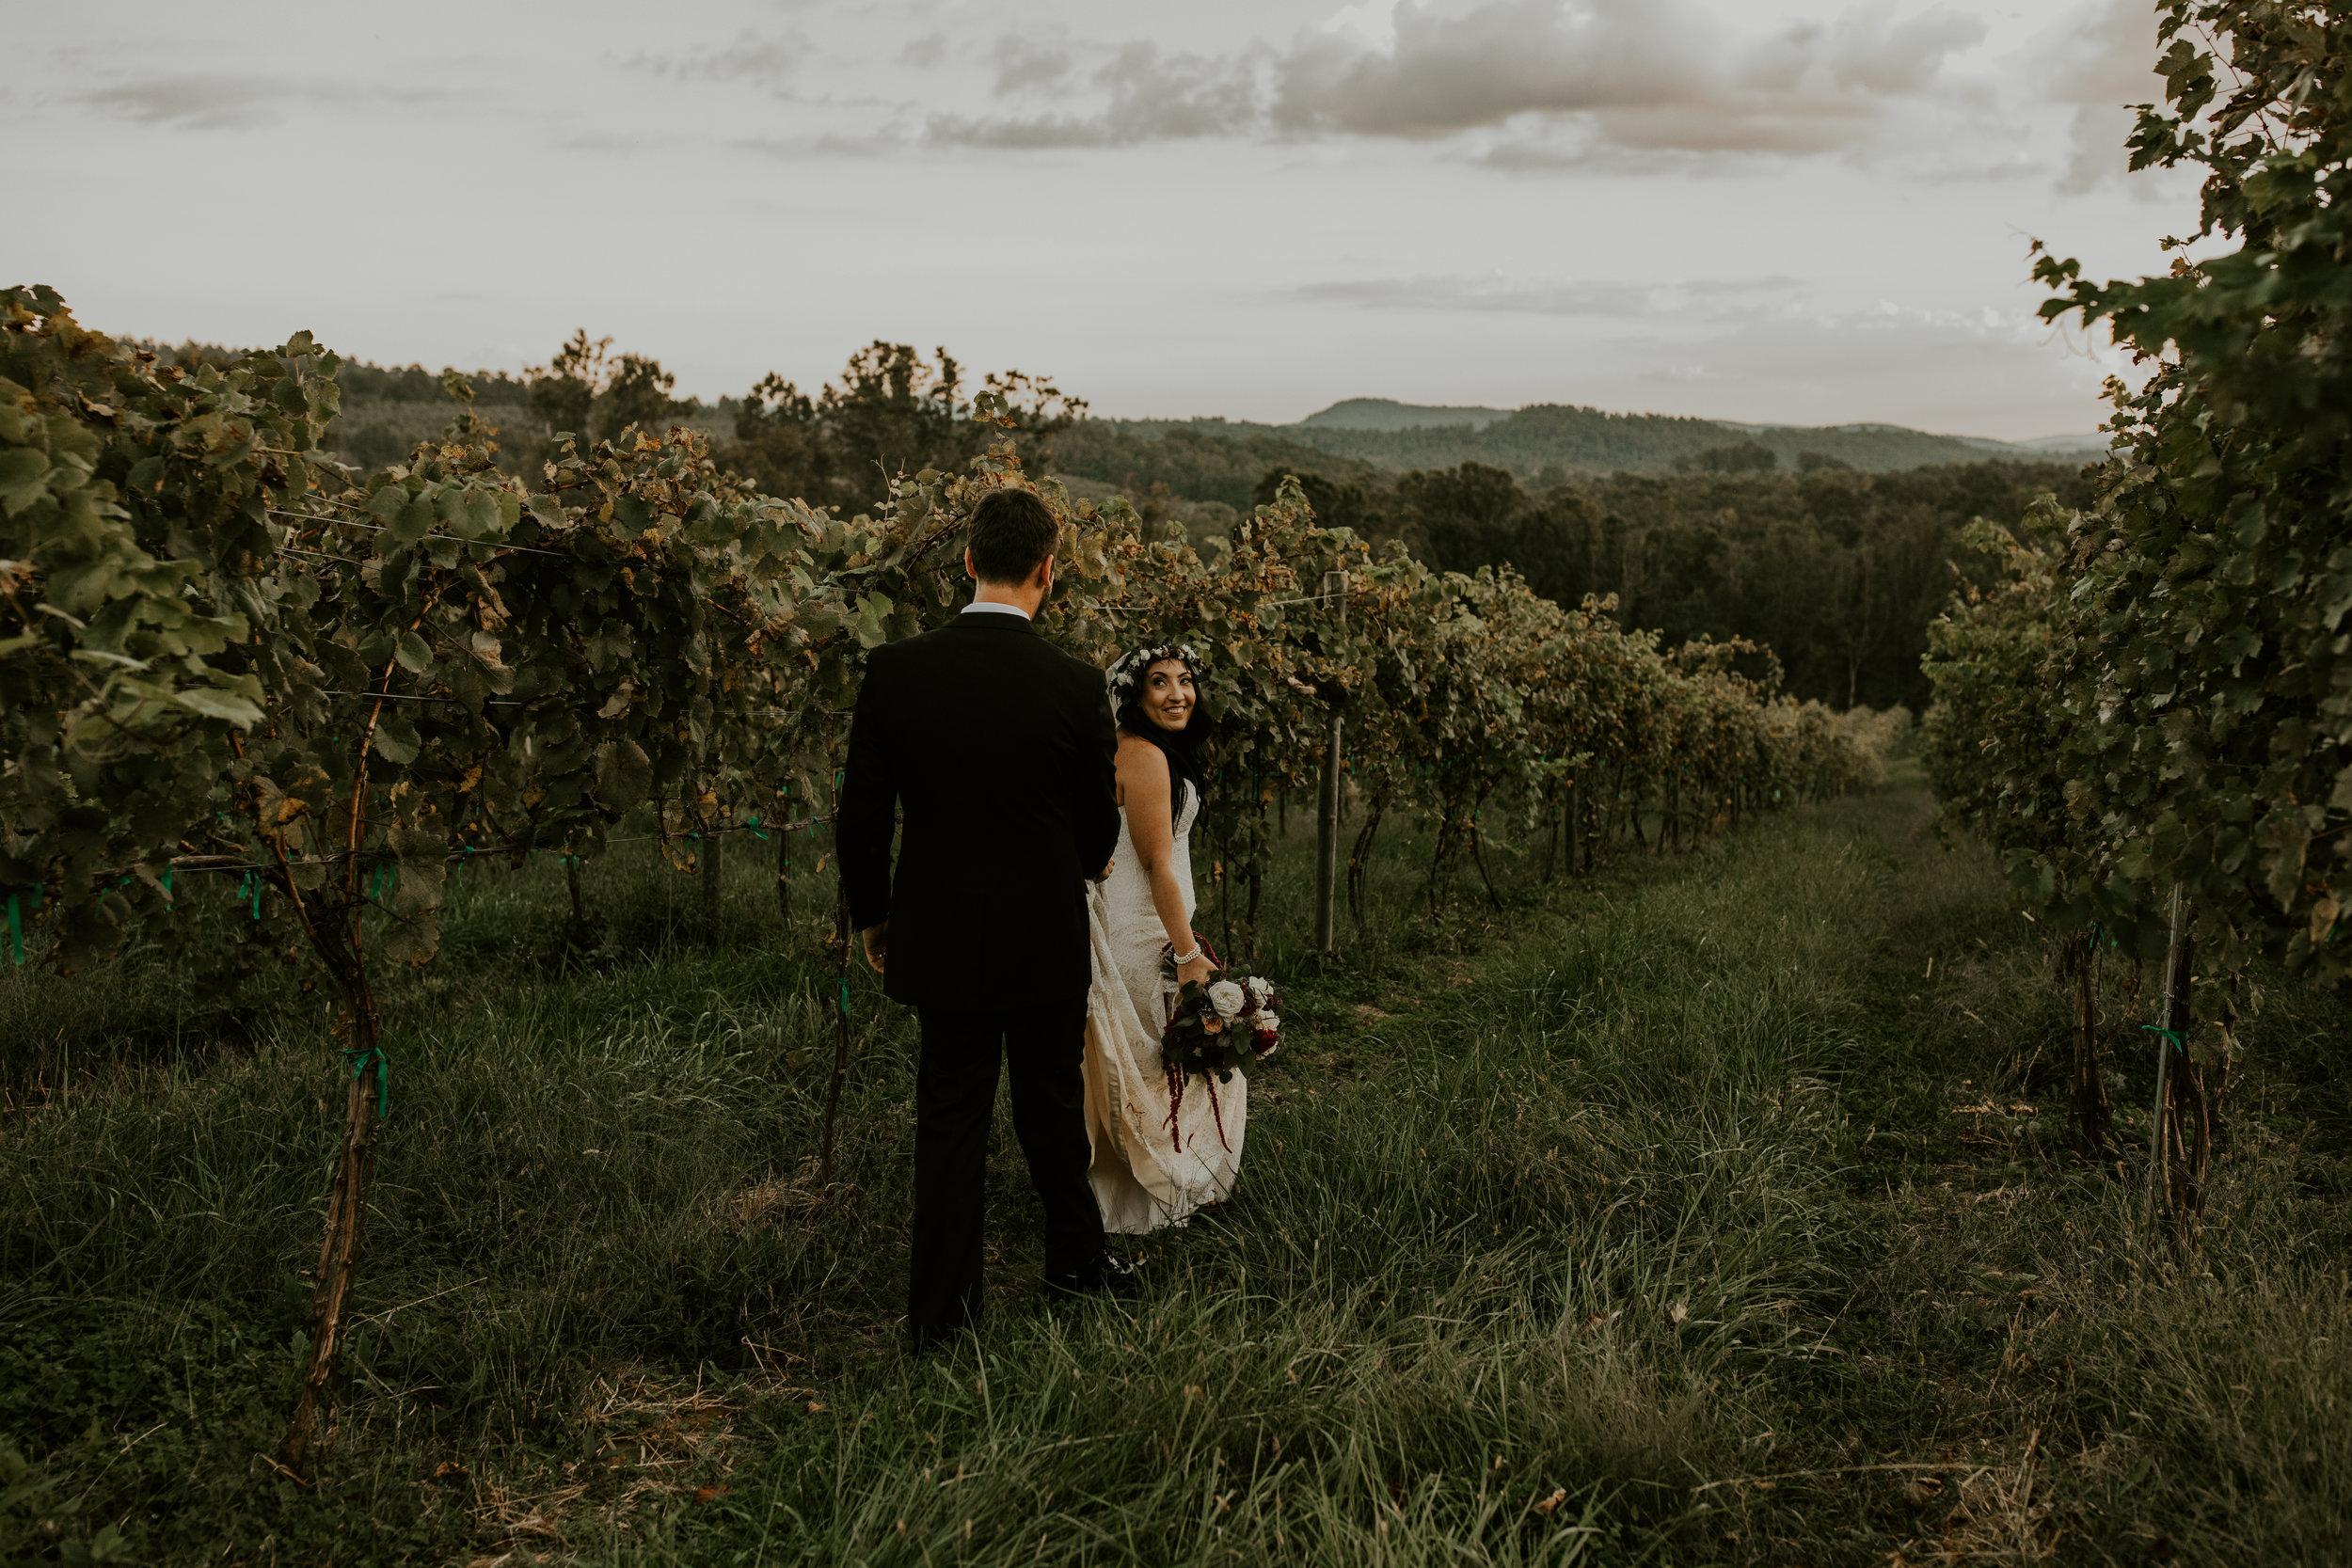 Point Lookout Vineyards Hendersonville North Carolina -Wedding-Renee and Jason-75.JPG